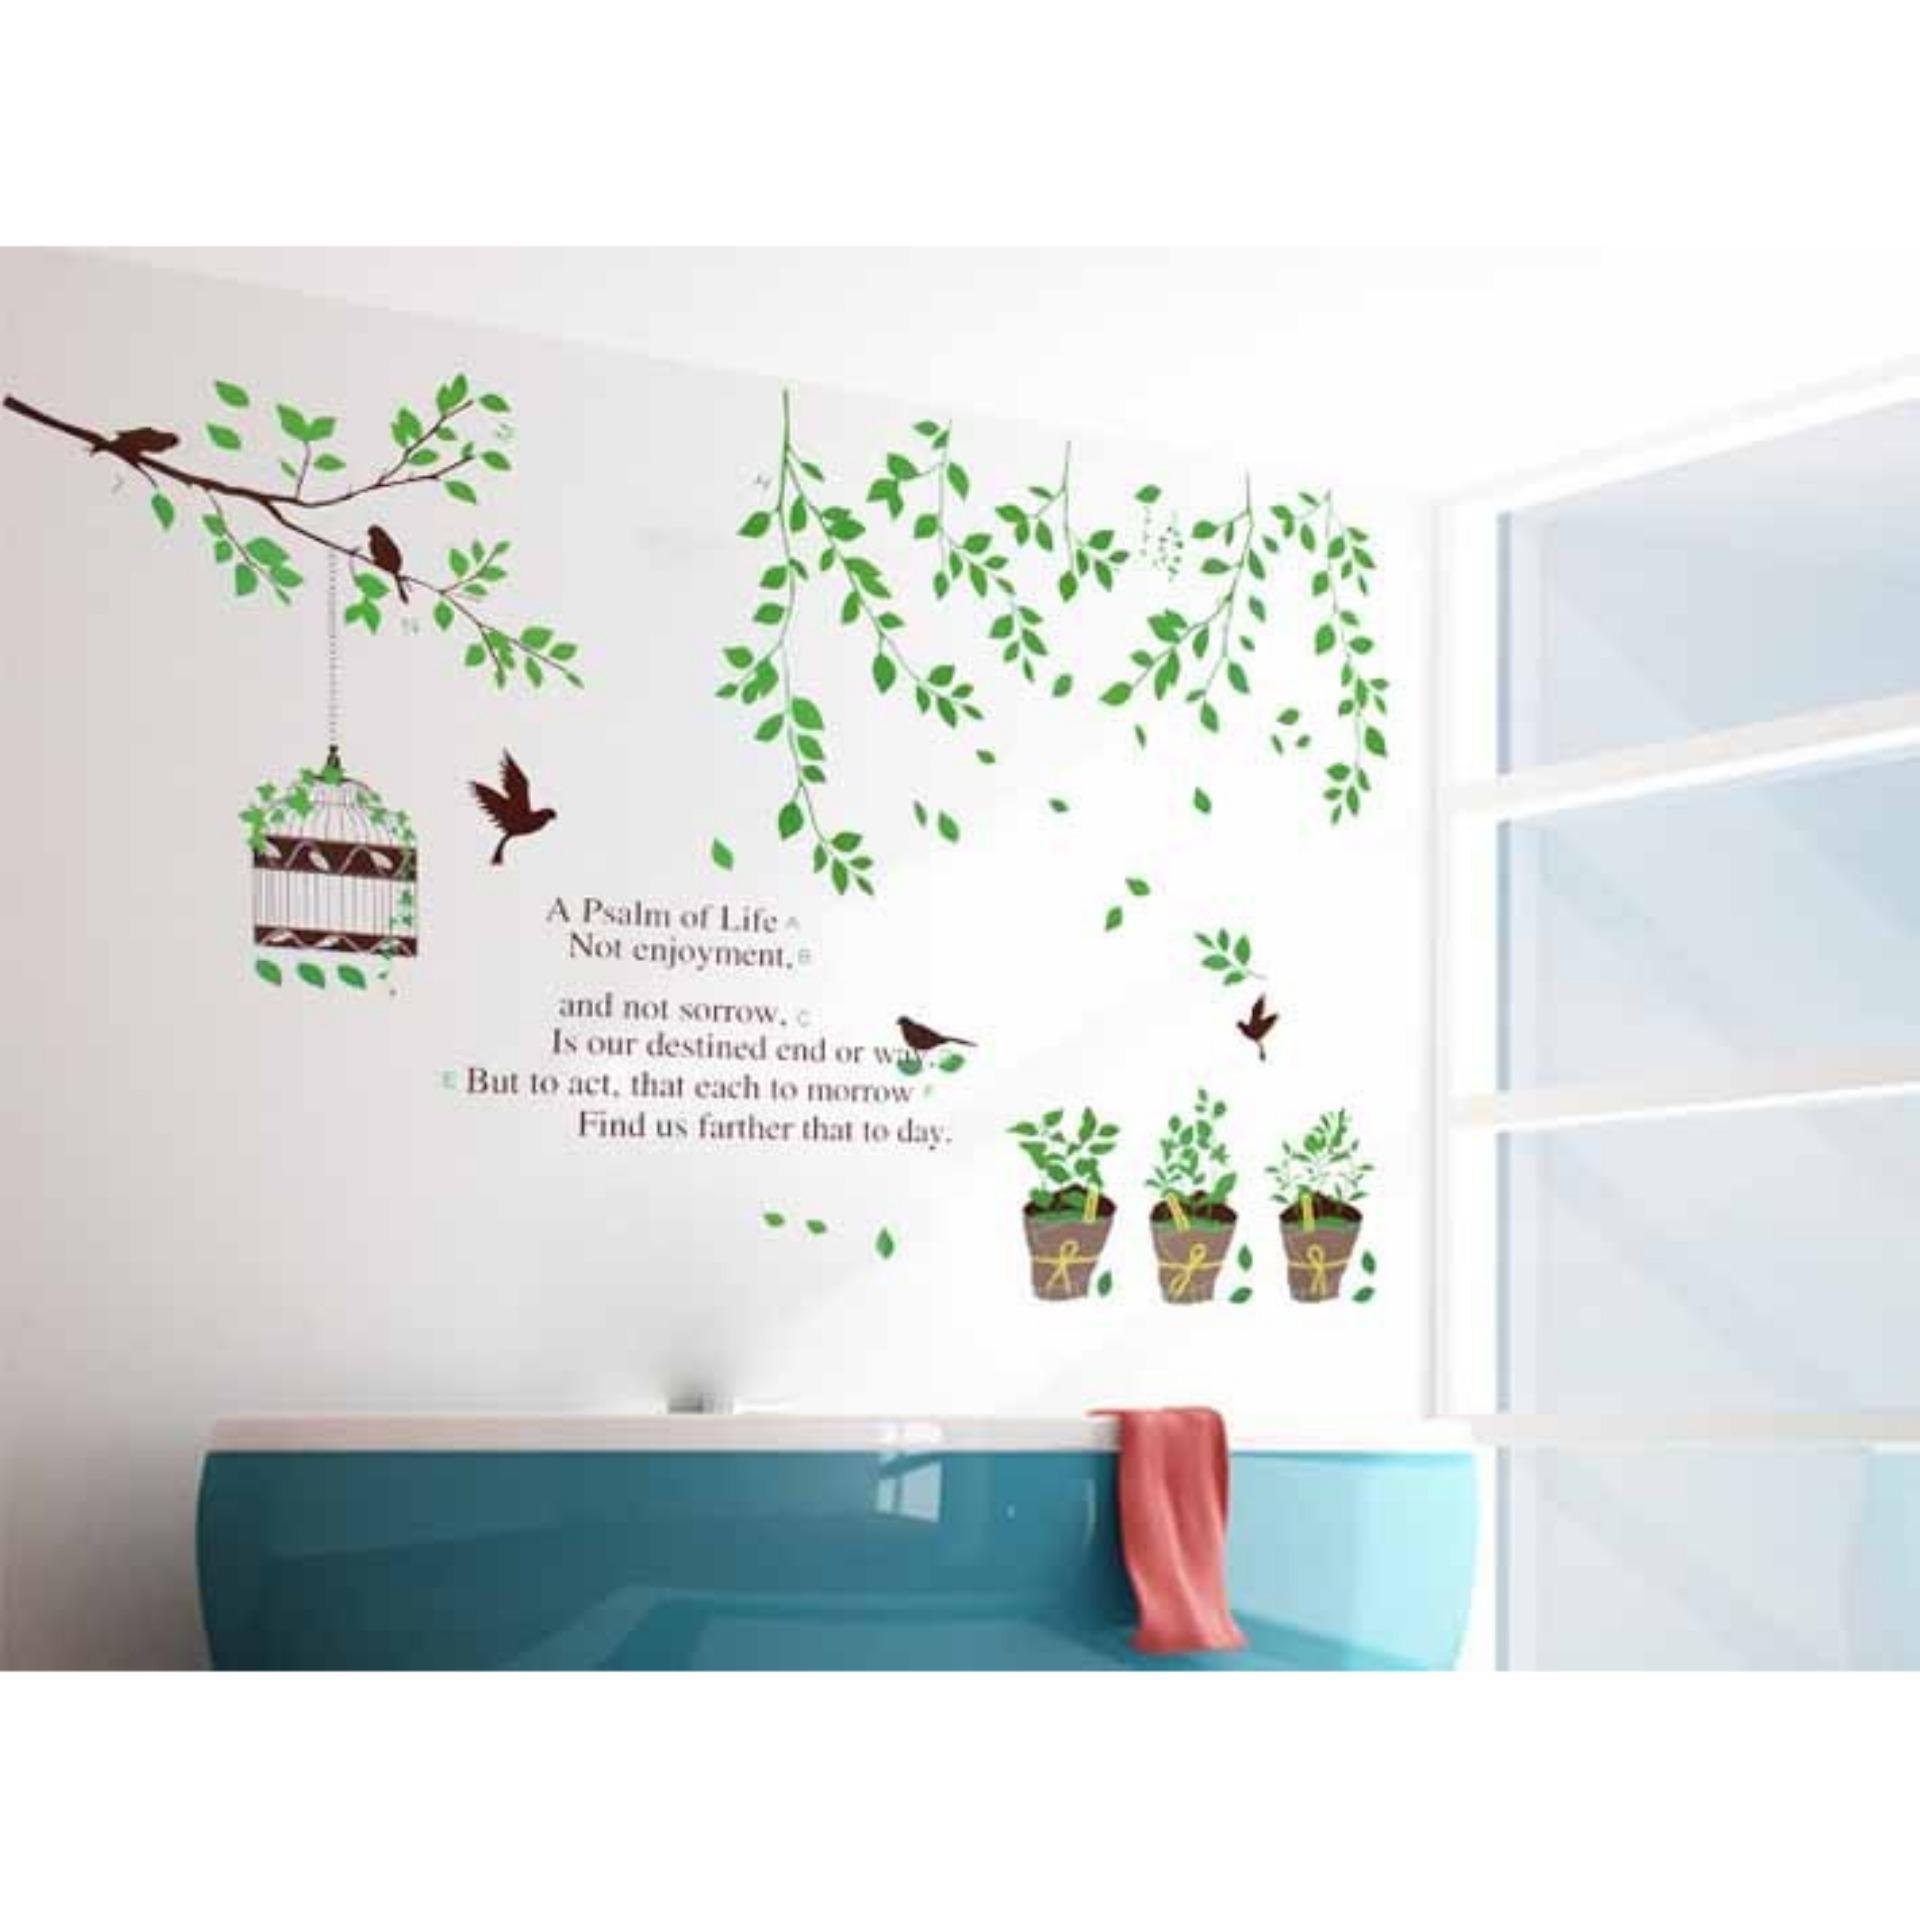 Wallsticker Stiker Dinding Motif Tumbuhan 60x90 - Multicolor